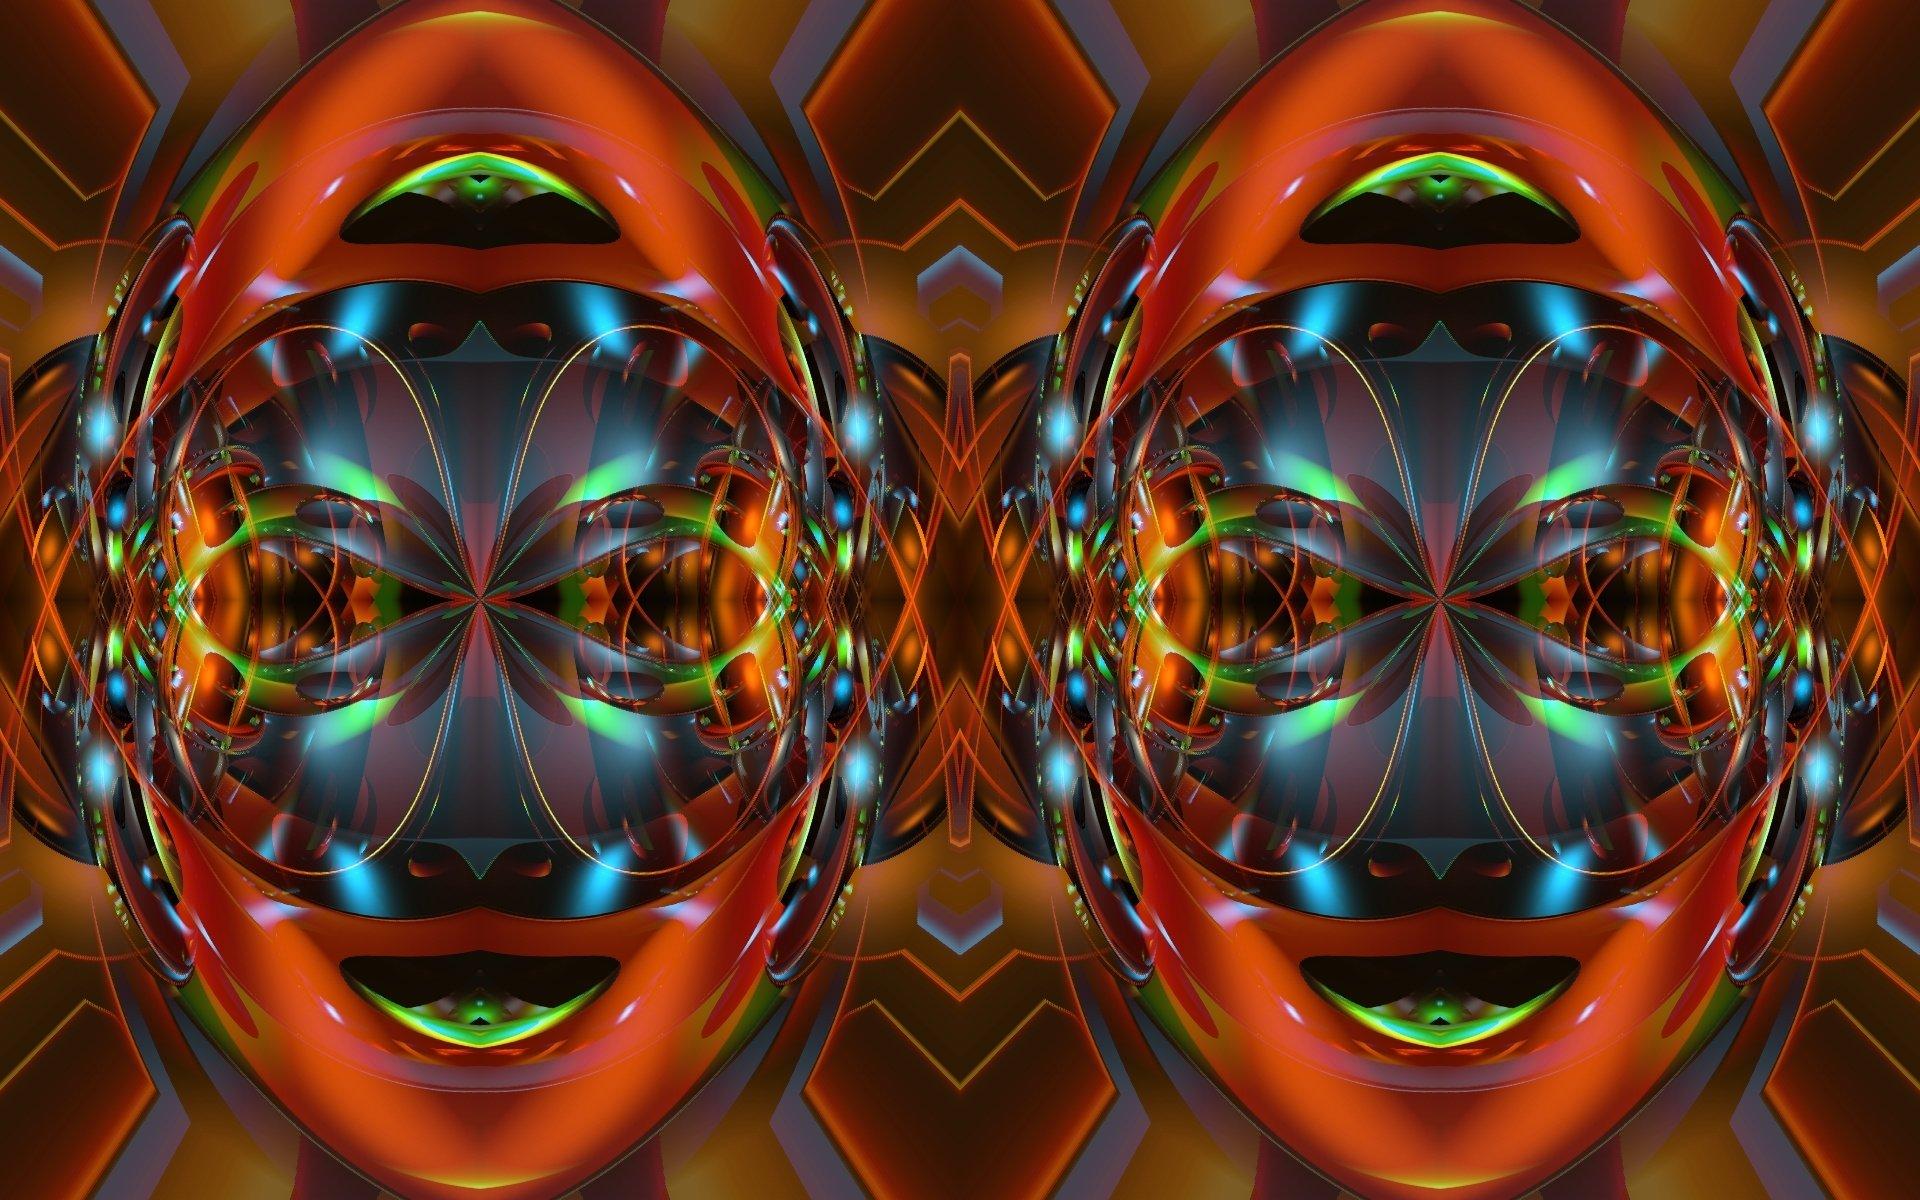 Abstract - Digital Art  Artistic Face Abstract Wallpaper